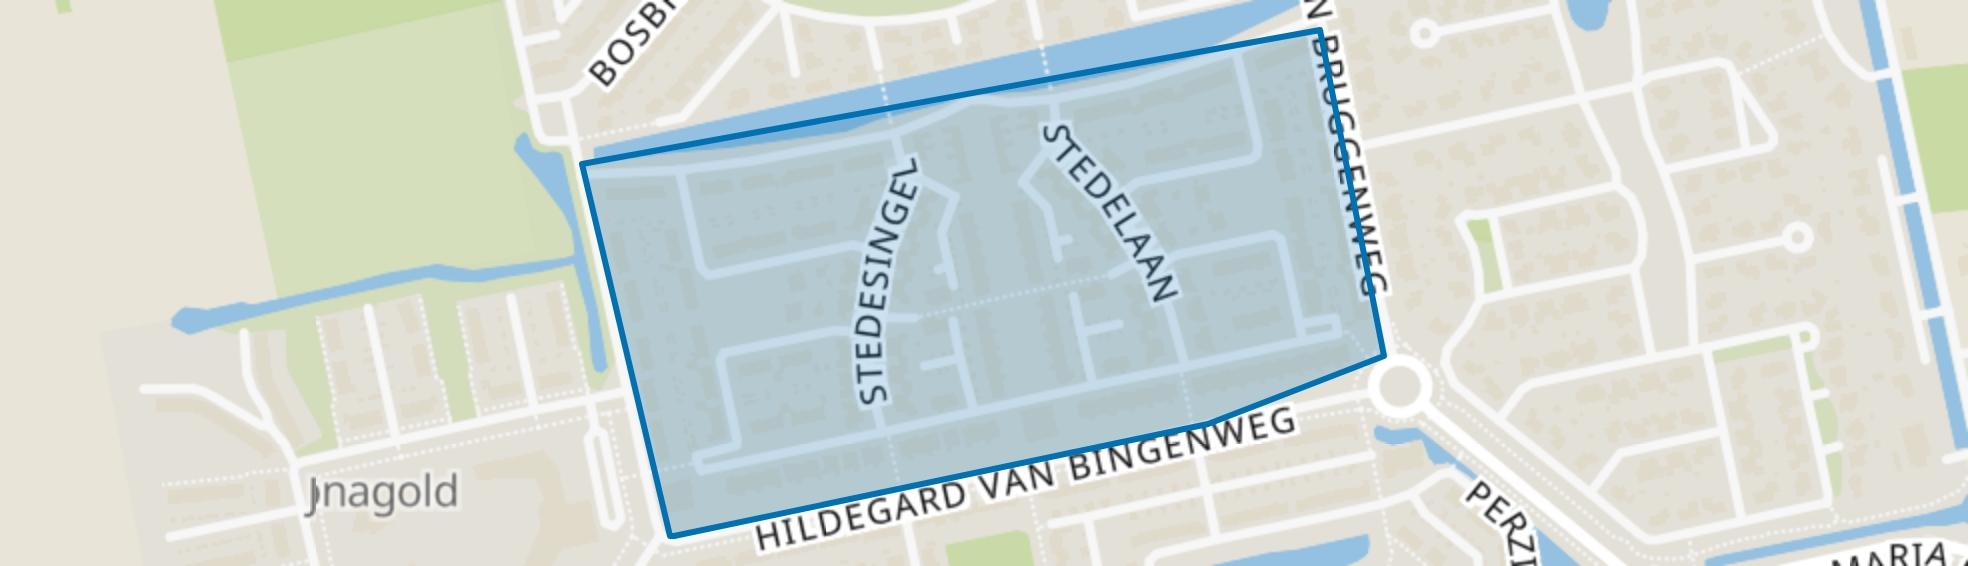 Kloosterstede, Assen map